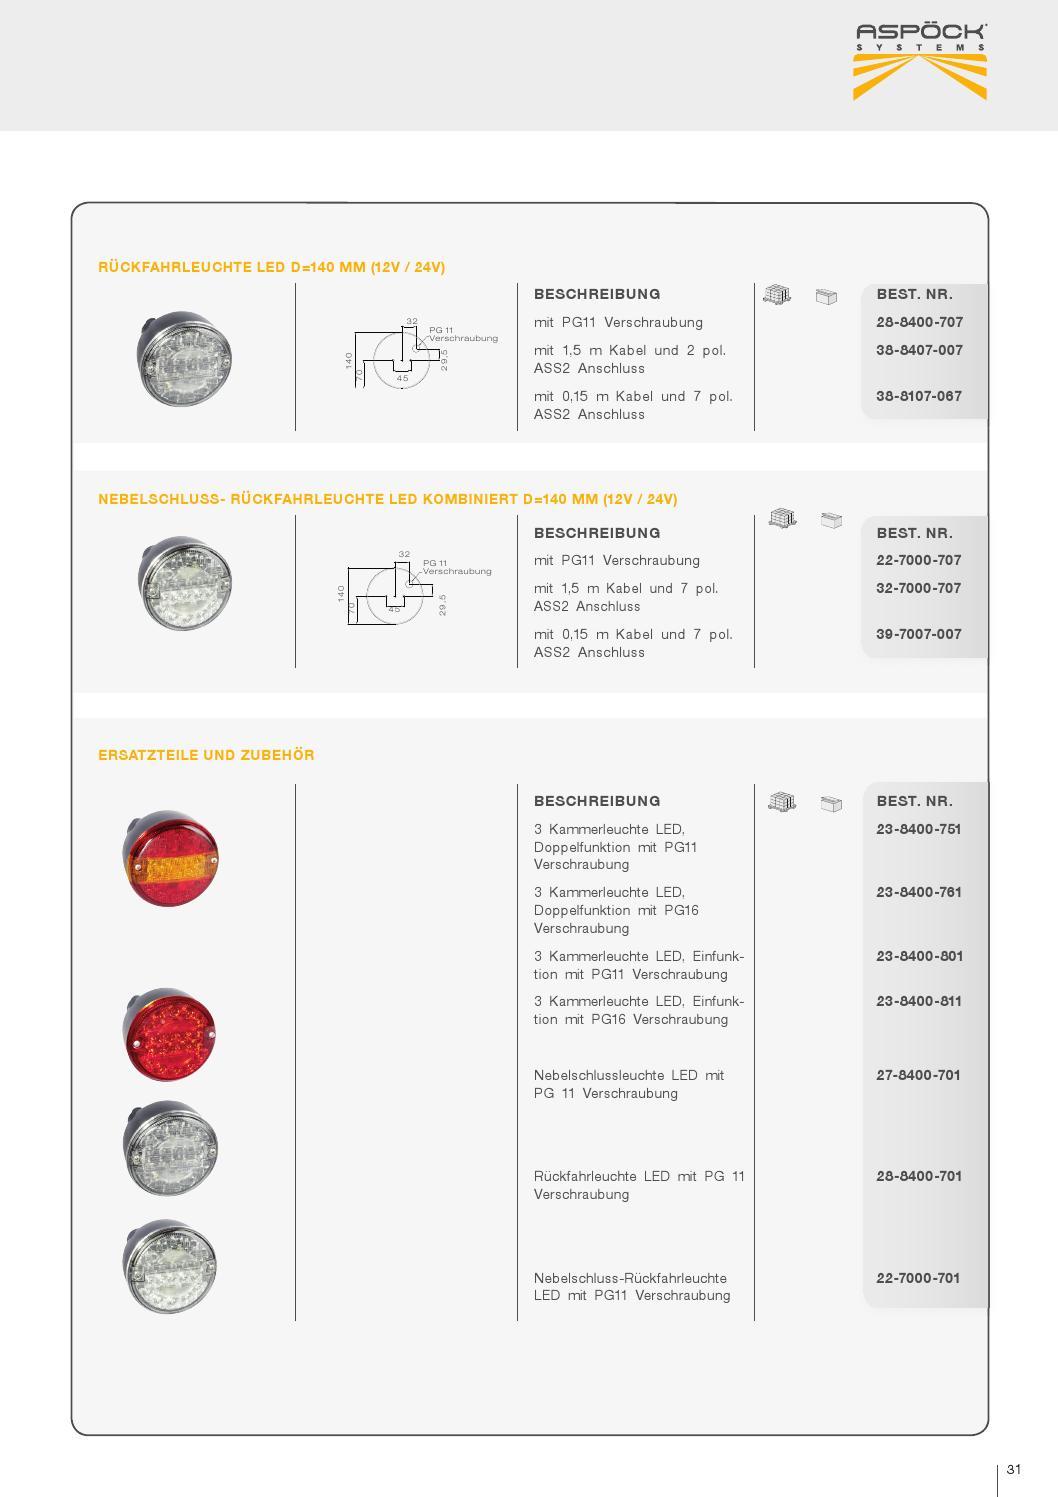 PMC_de_Aspoeck24V_Produktkatalog by Matik AG - issuu